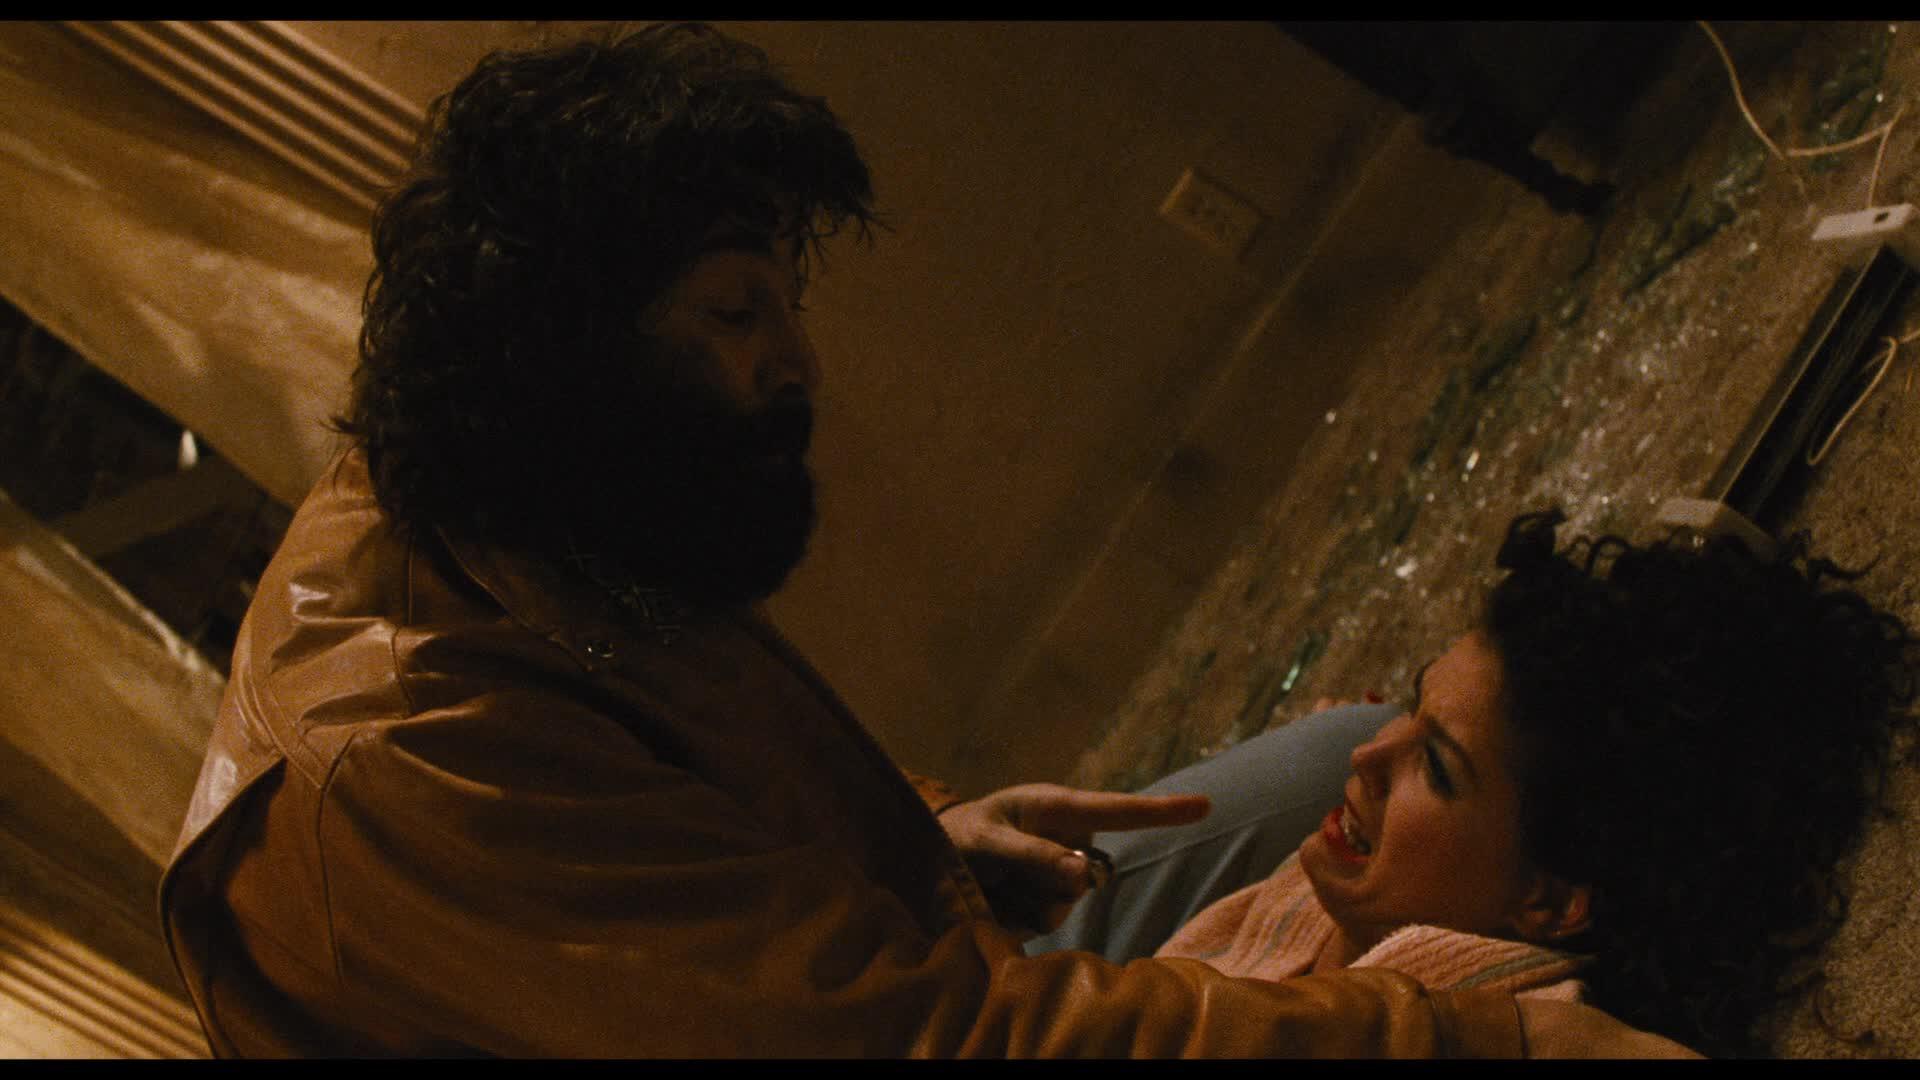 Leo Rossi and Paula Trickey in Maniac Cop 2 (1990)